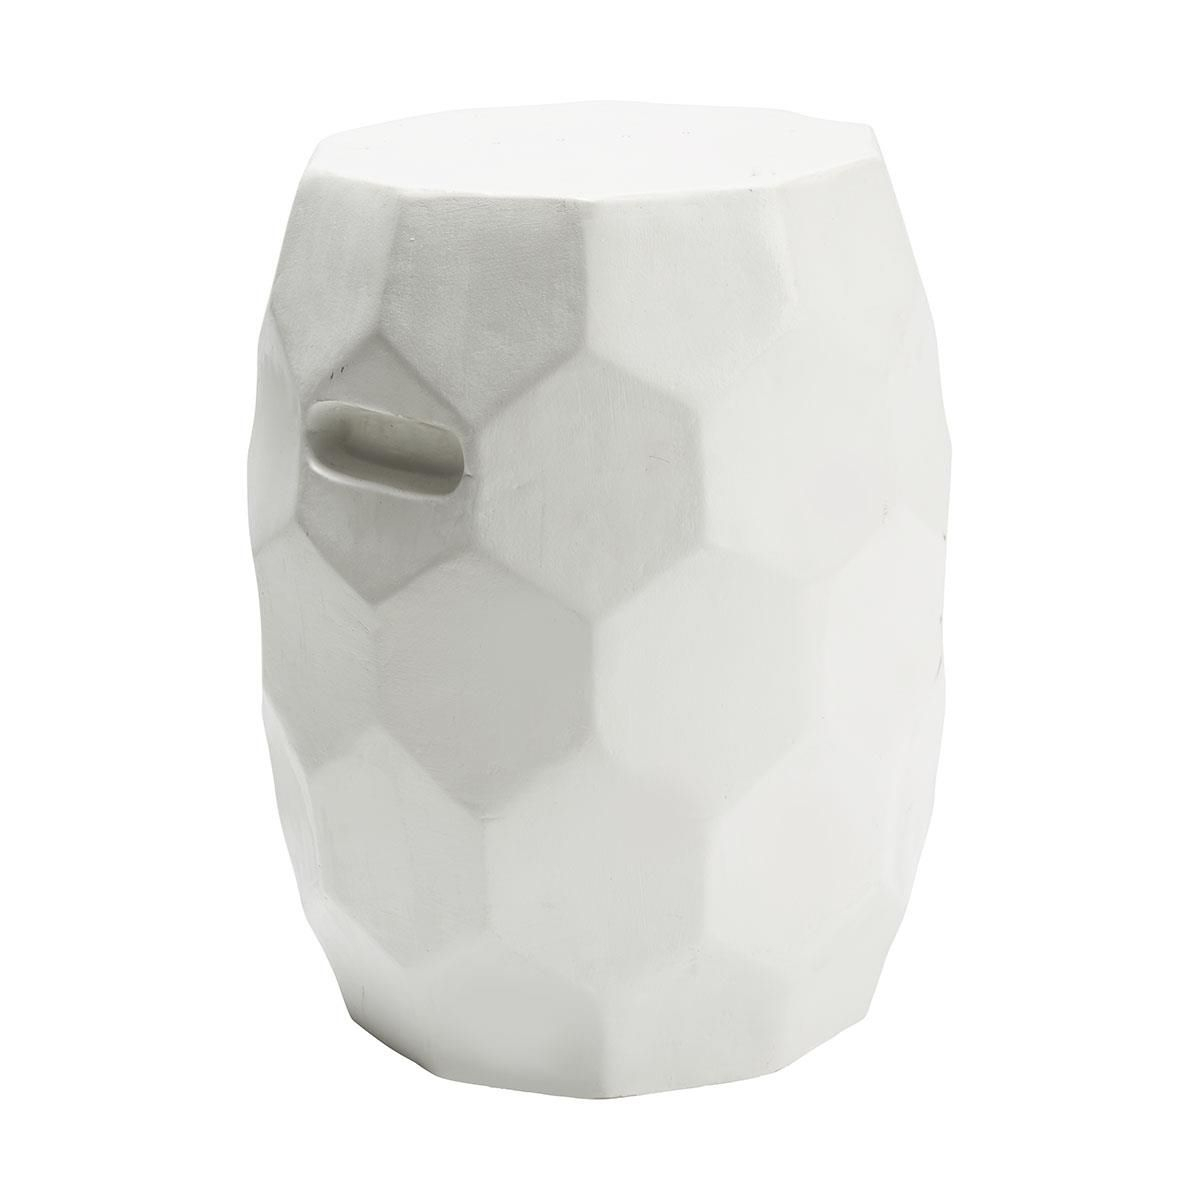 Honeycomb Garden Stool – White | Kmart | Garden Stool Within Murphy Ceramic Garden Stools (View 24 of 25)